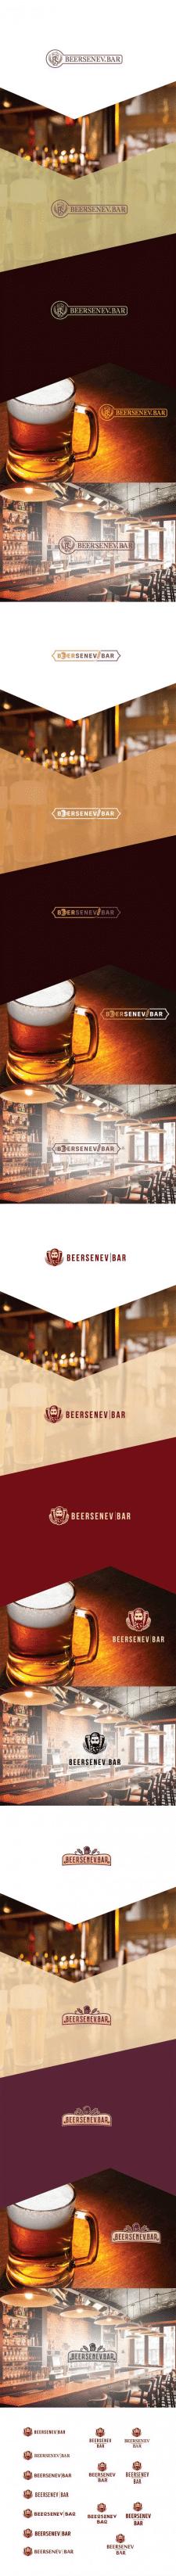 Бар крафтового пива «Beersenev.bar»